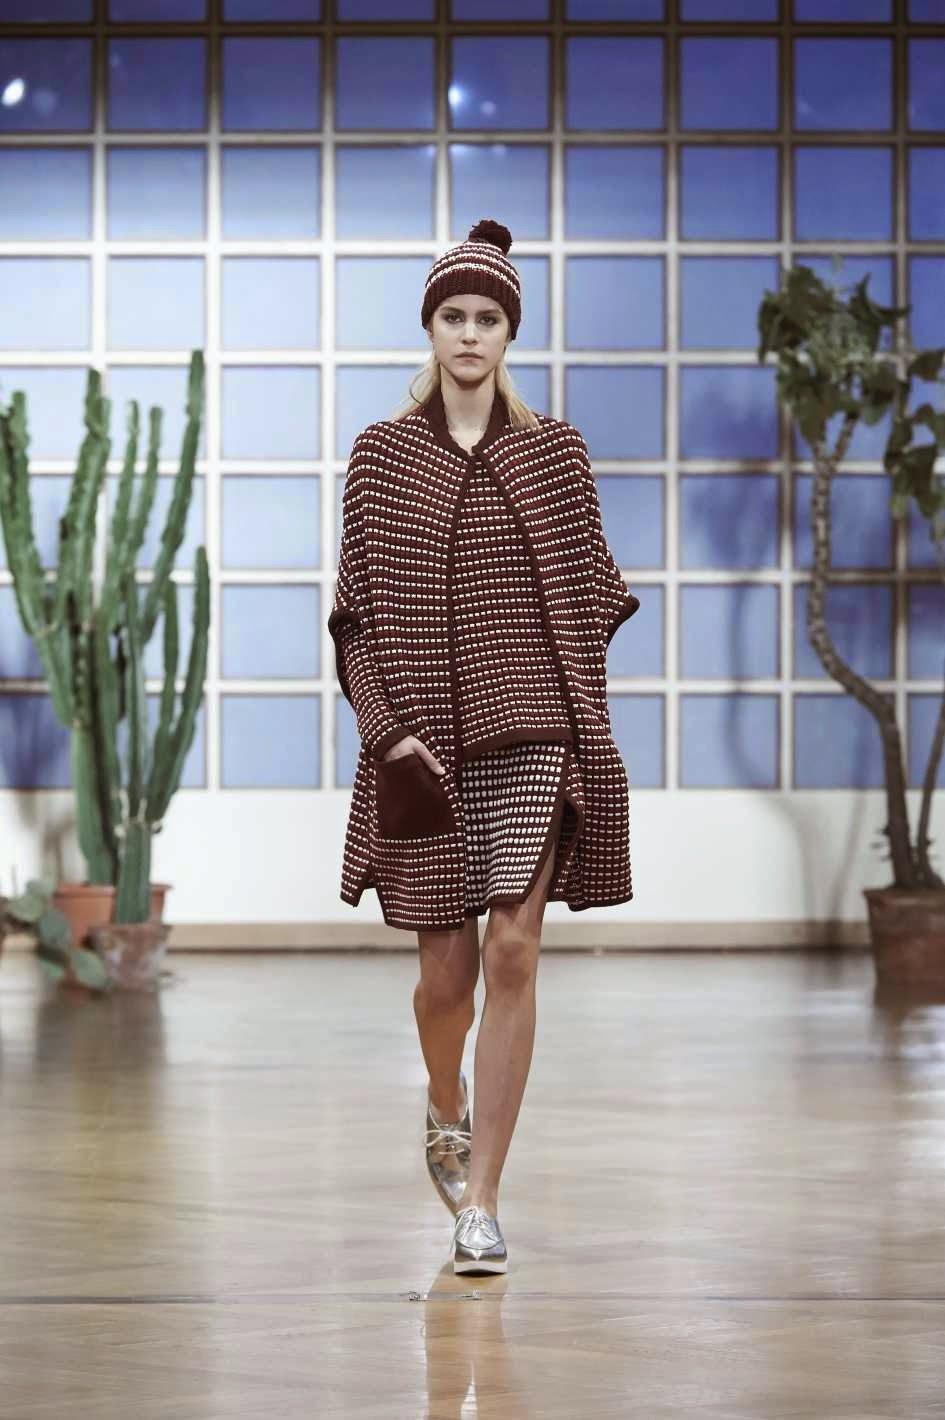 Proactive fashion show mall las vegas # Collagen Hydrolysate Serotonin - Mary Kay Wrinkle Cream